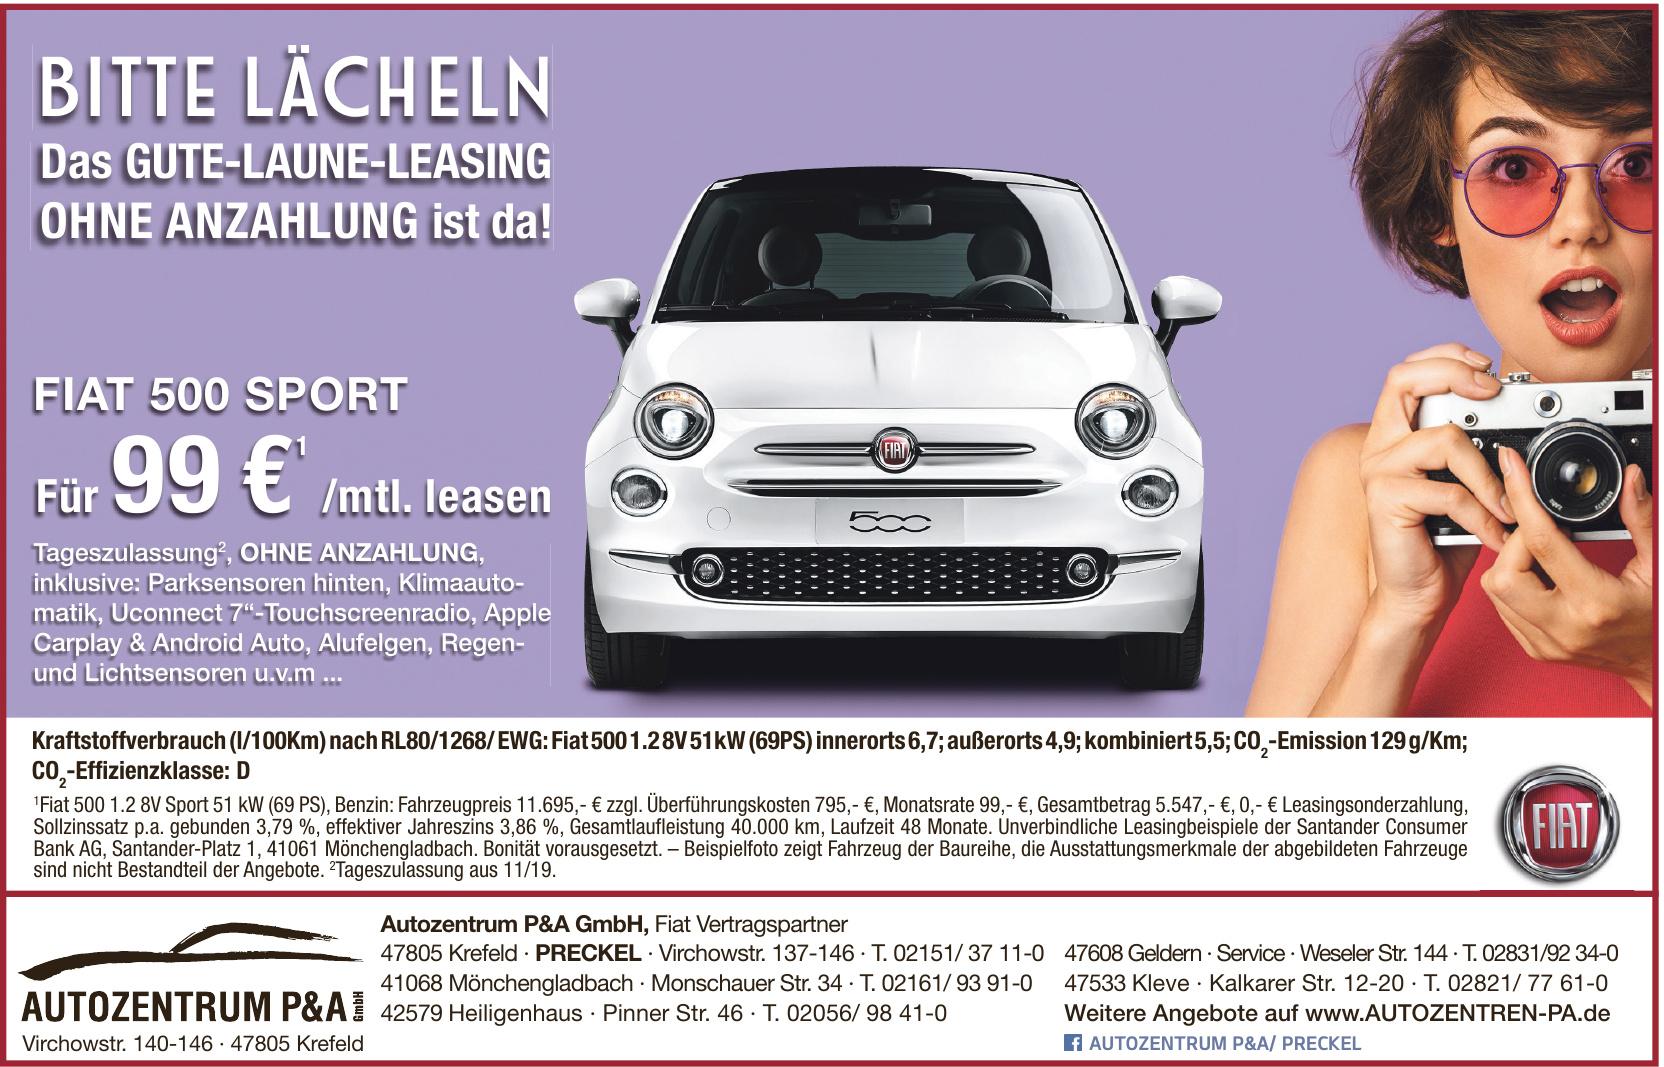 Autozentrum P&A GmbH